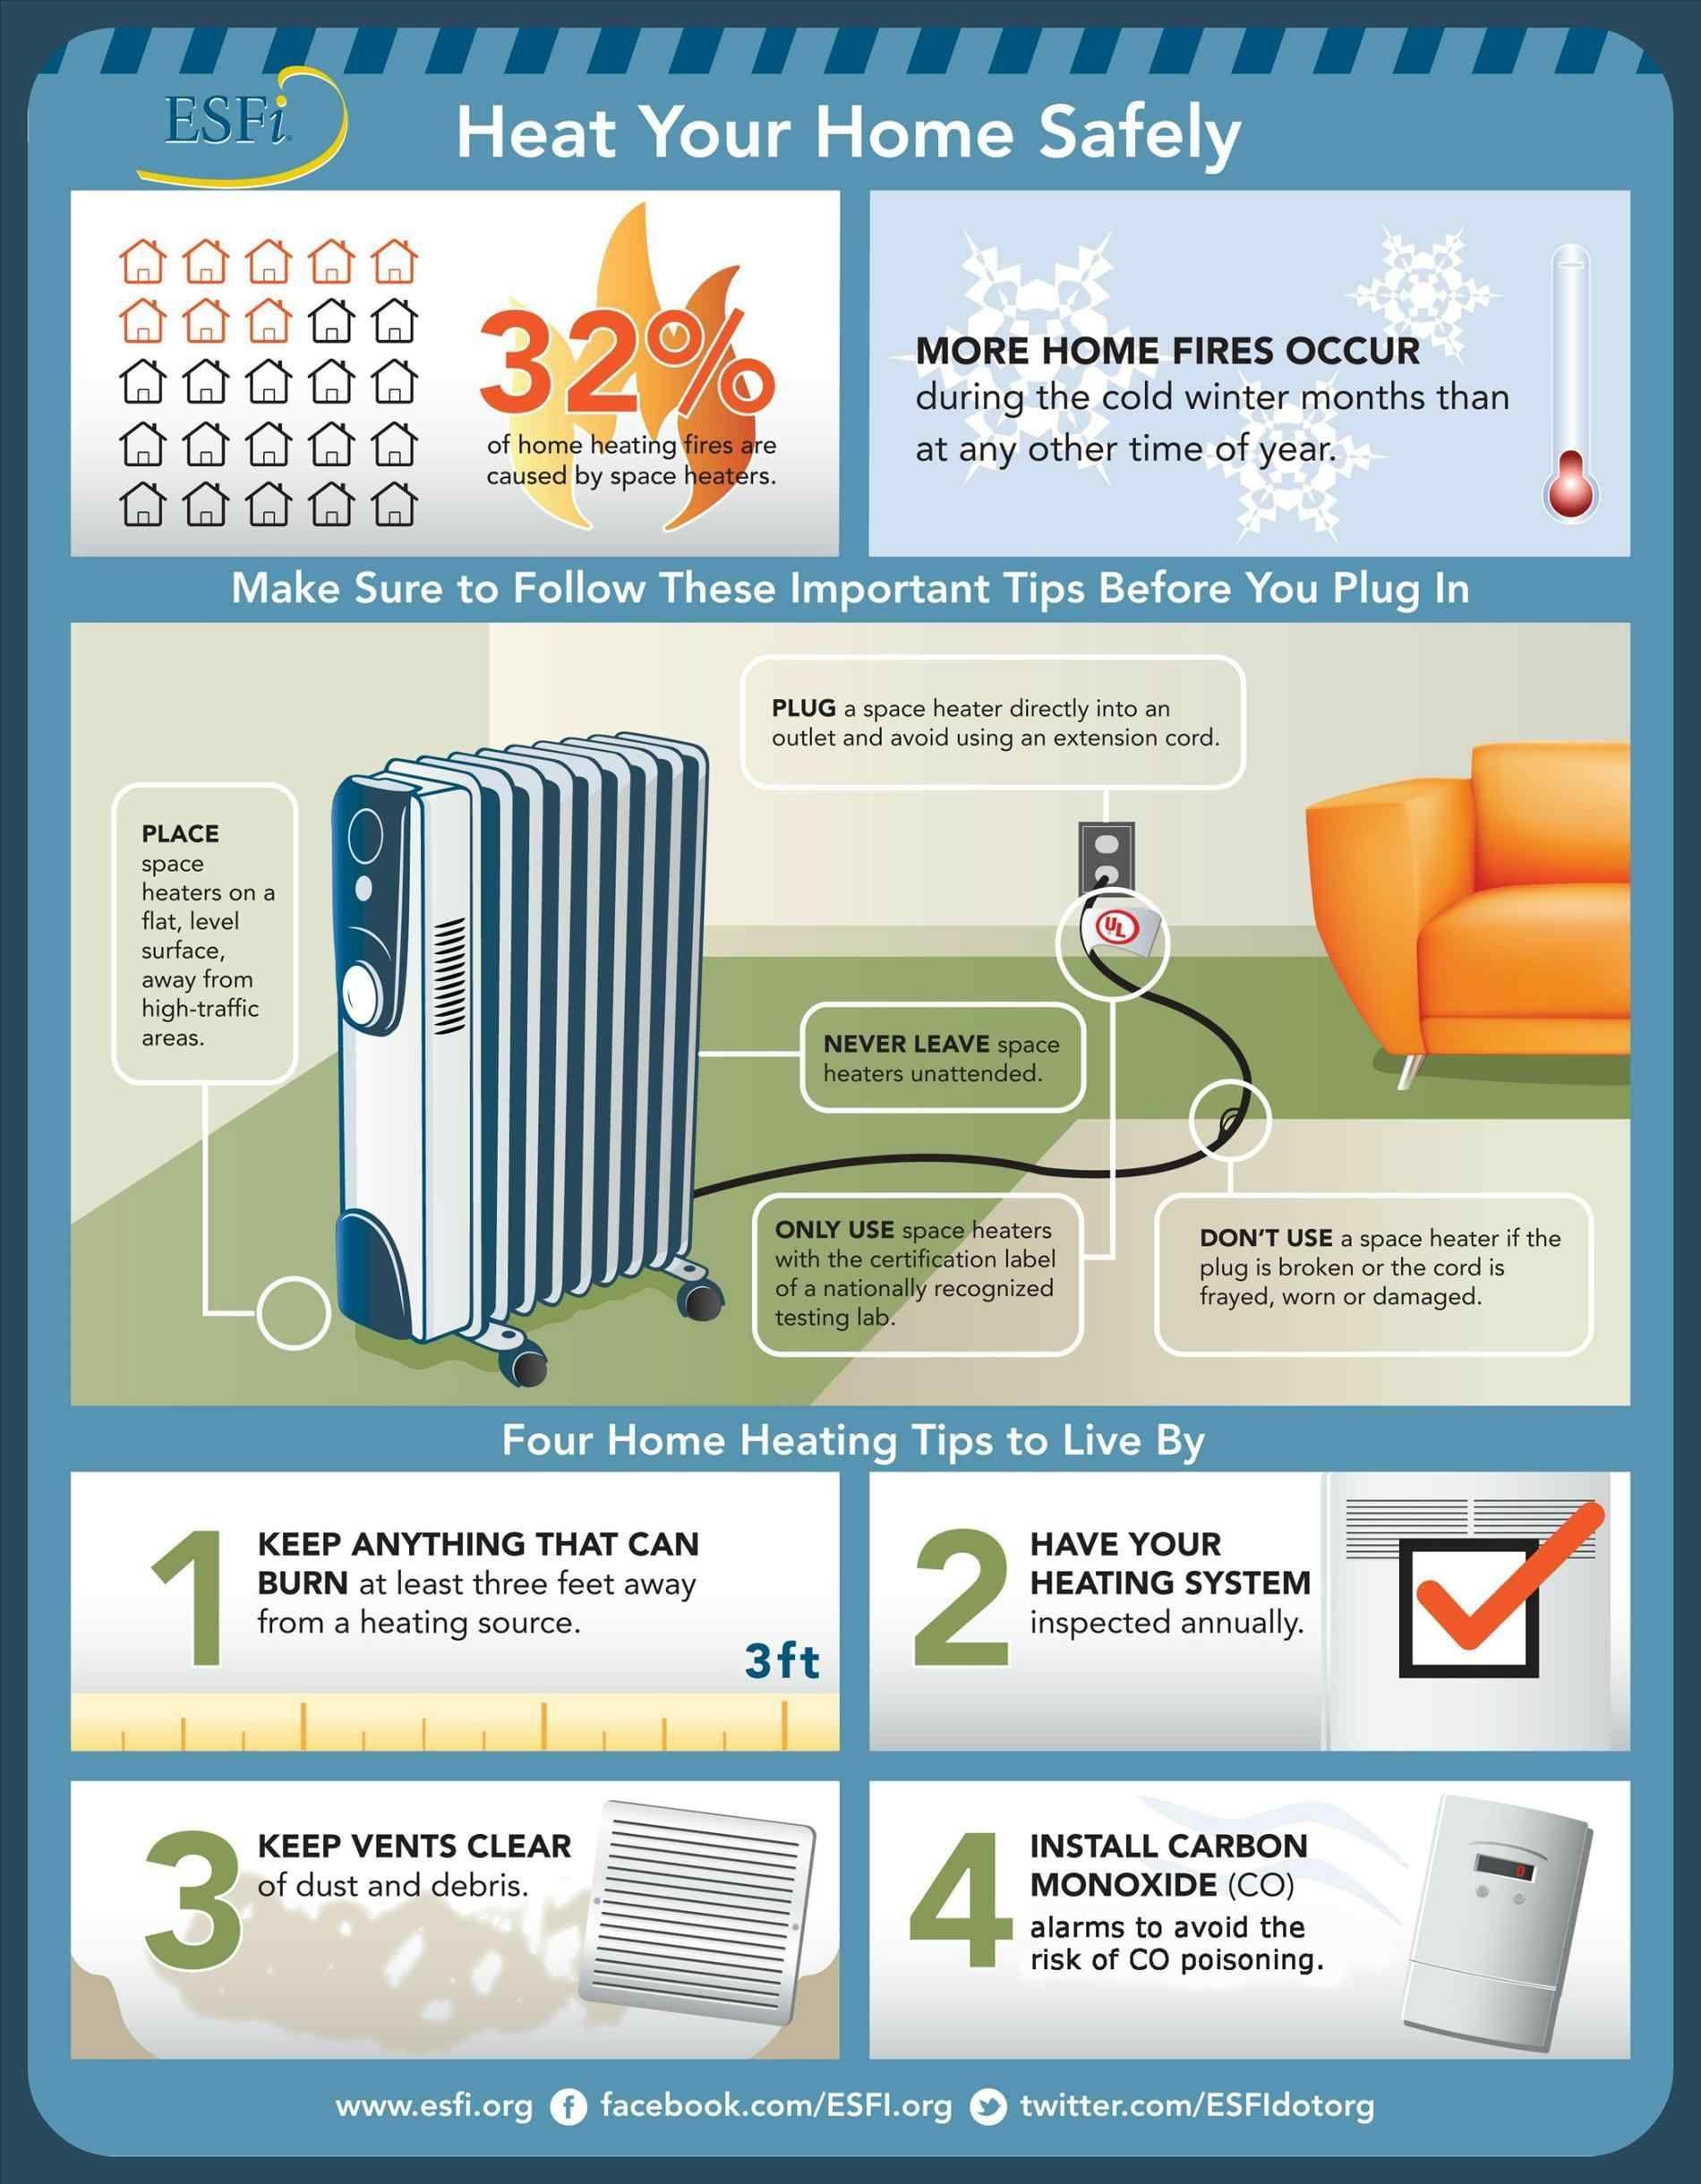 Sierramechanical Ofallonmo Home Heaters Safety Home Safety Tips Space Heater Safety Heating Systems